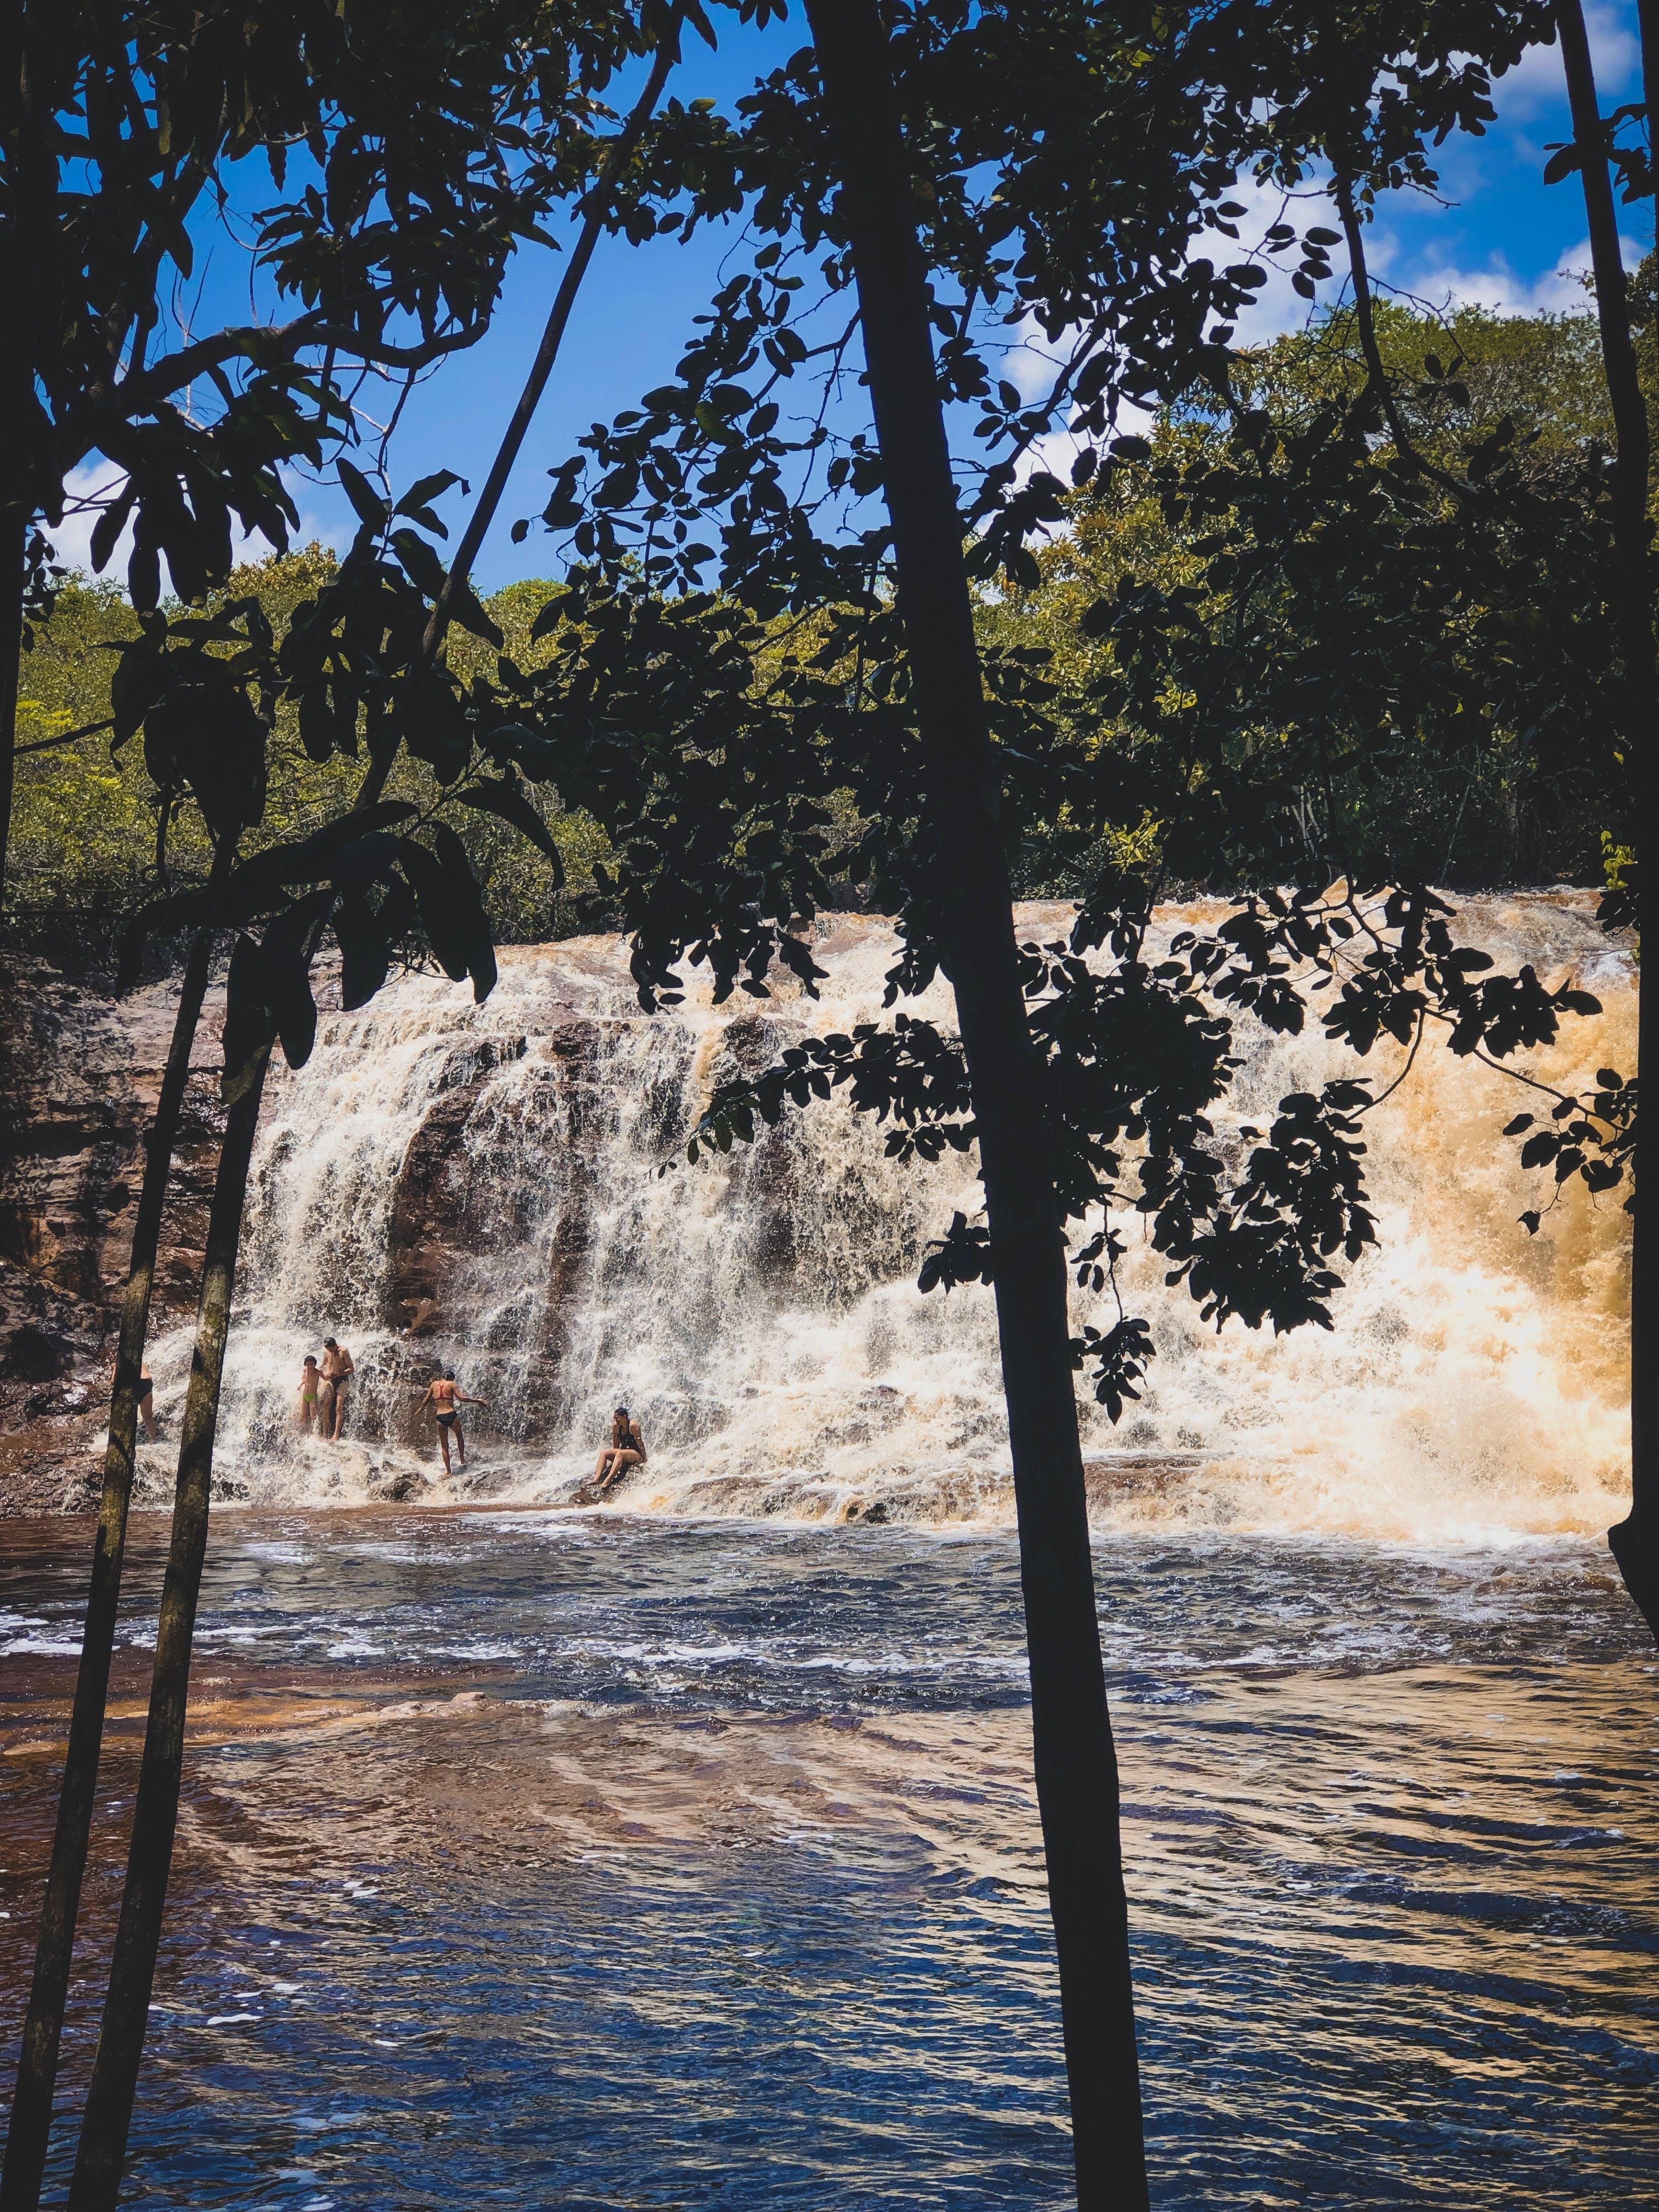 Gratis lagerfoto af #shotoniphone #nature #waterfall #brazil